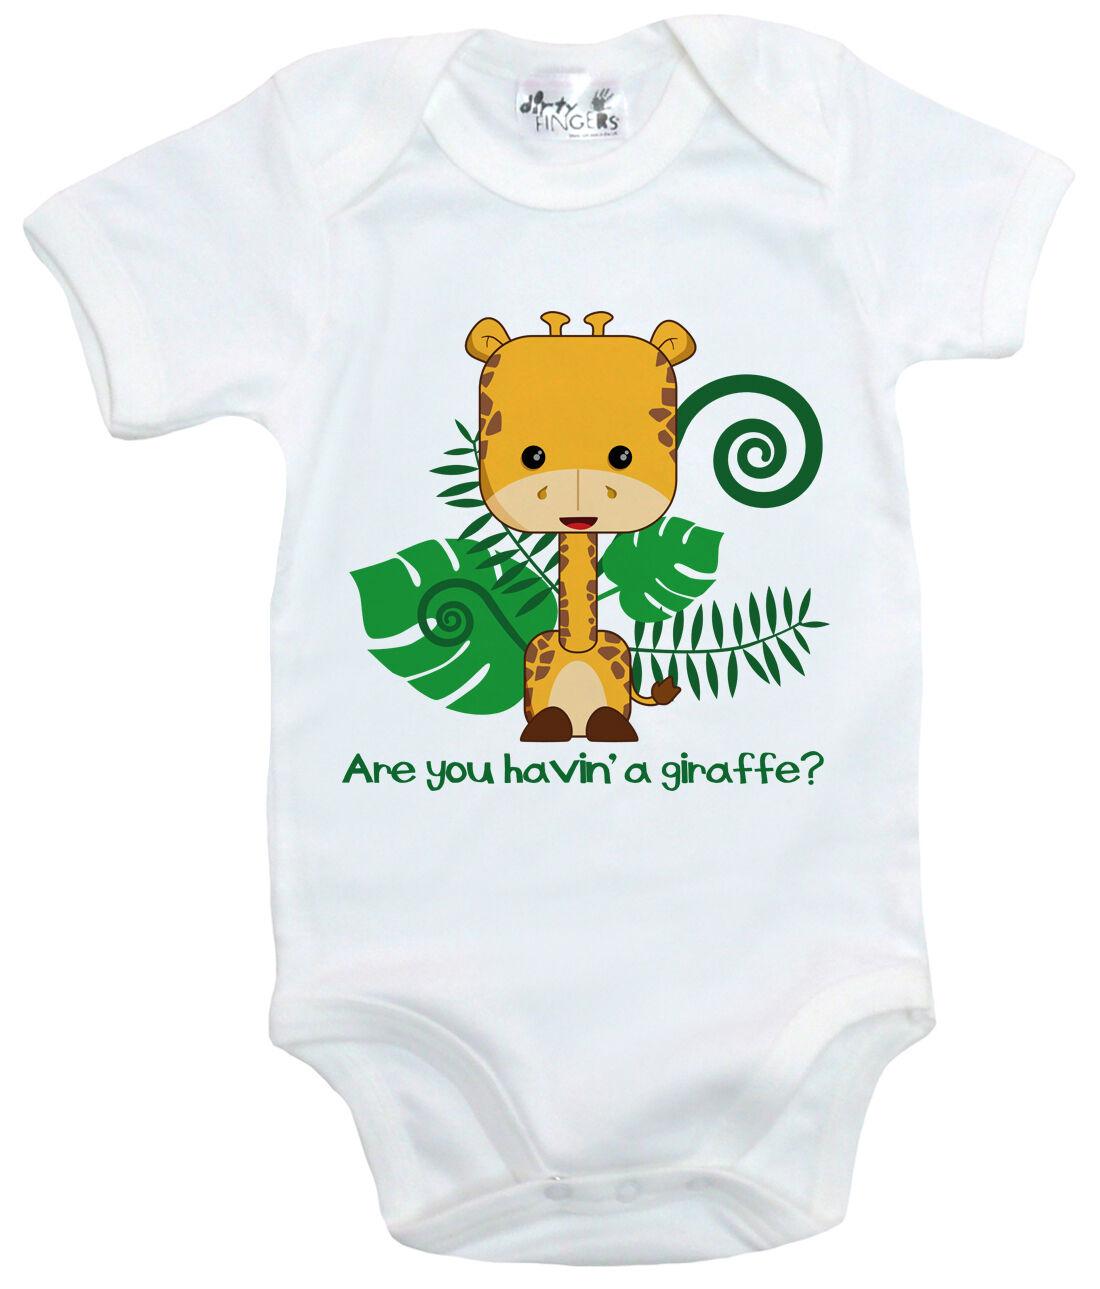 "Funny Baby Bodysuit /""Are you having a Giraffe?/"" Baby grow Vest Jungle Zoo Animal"